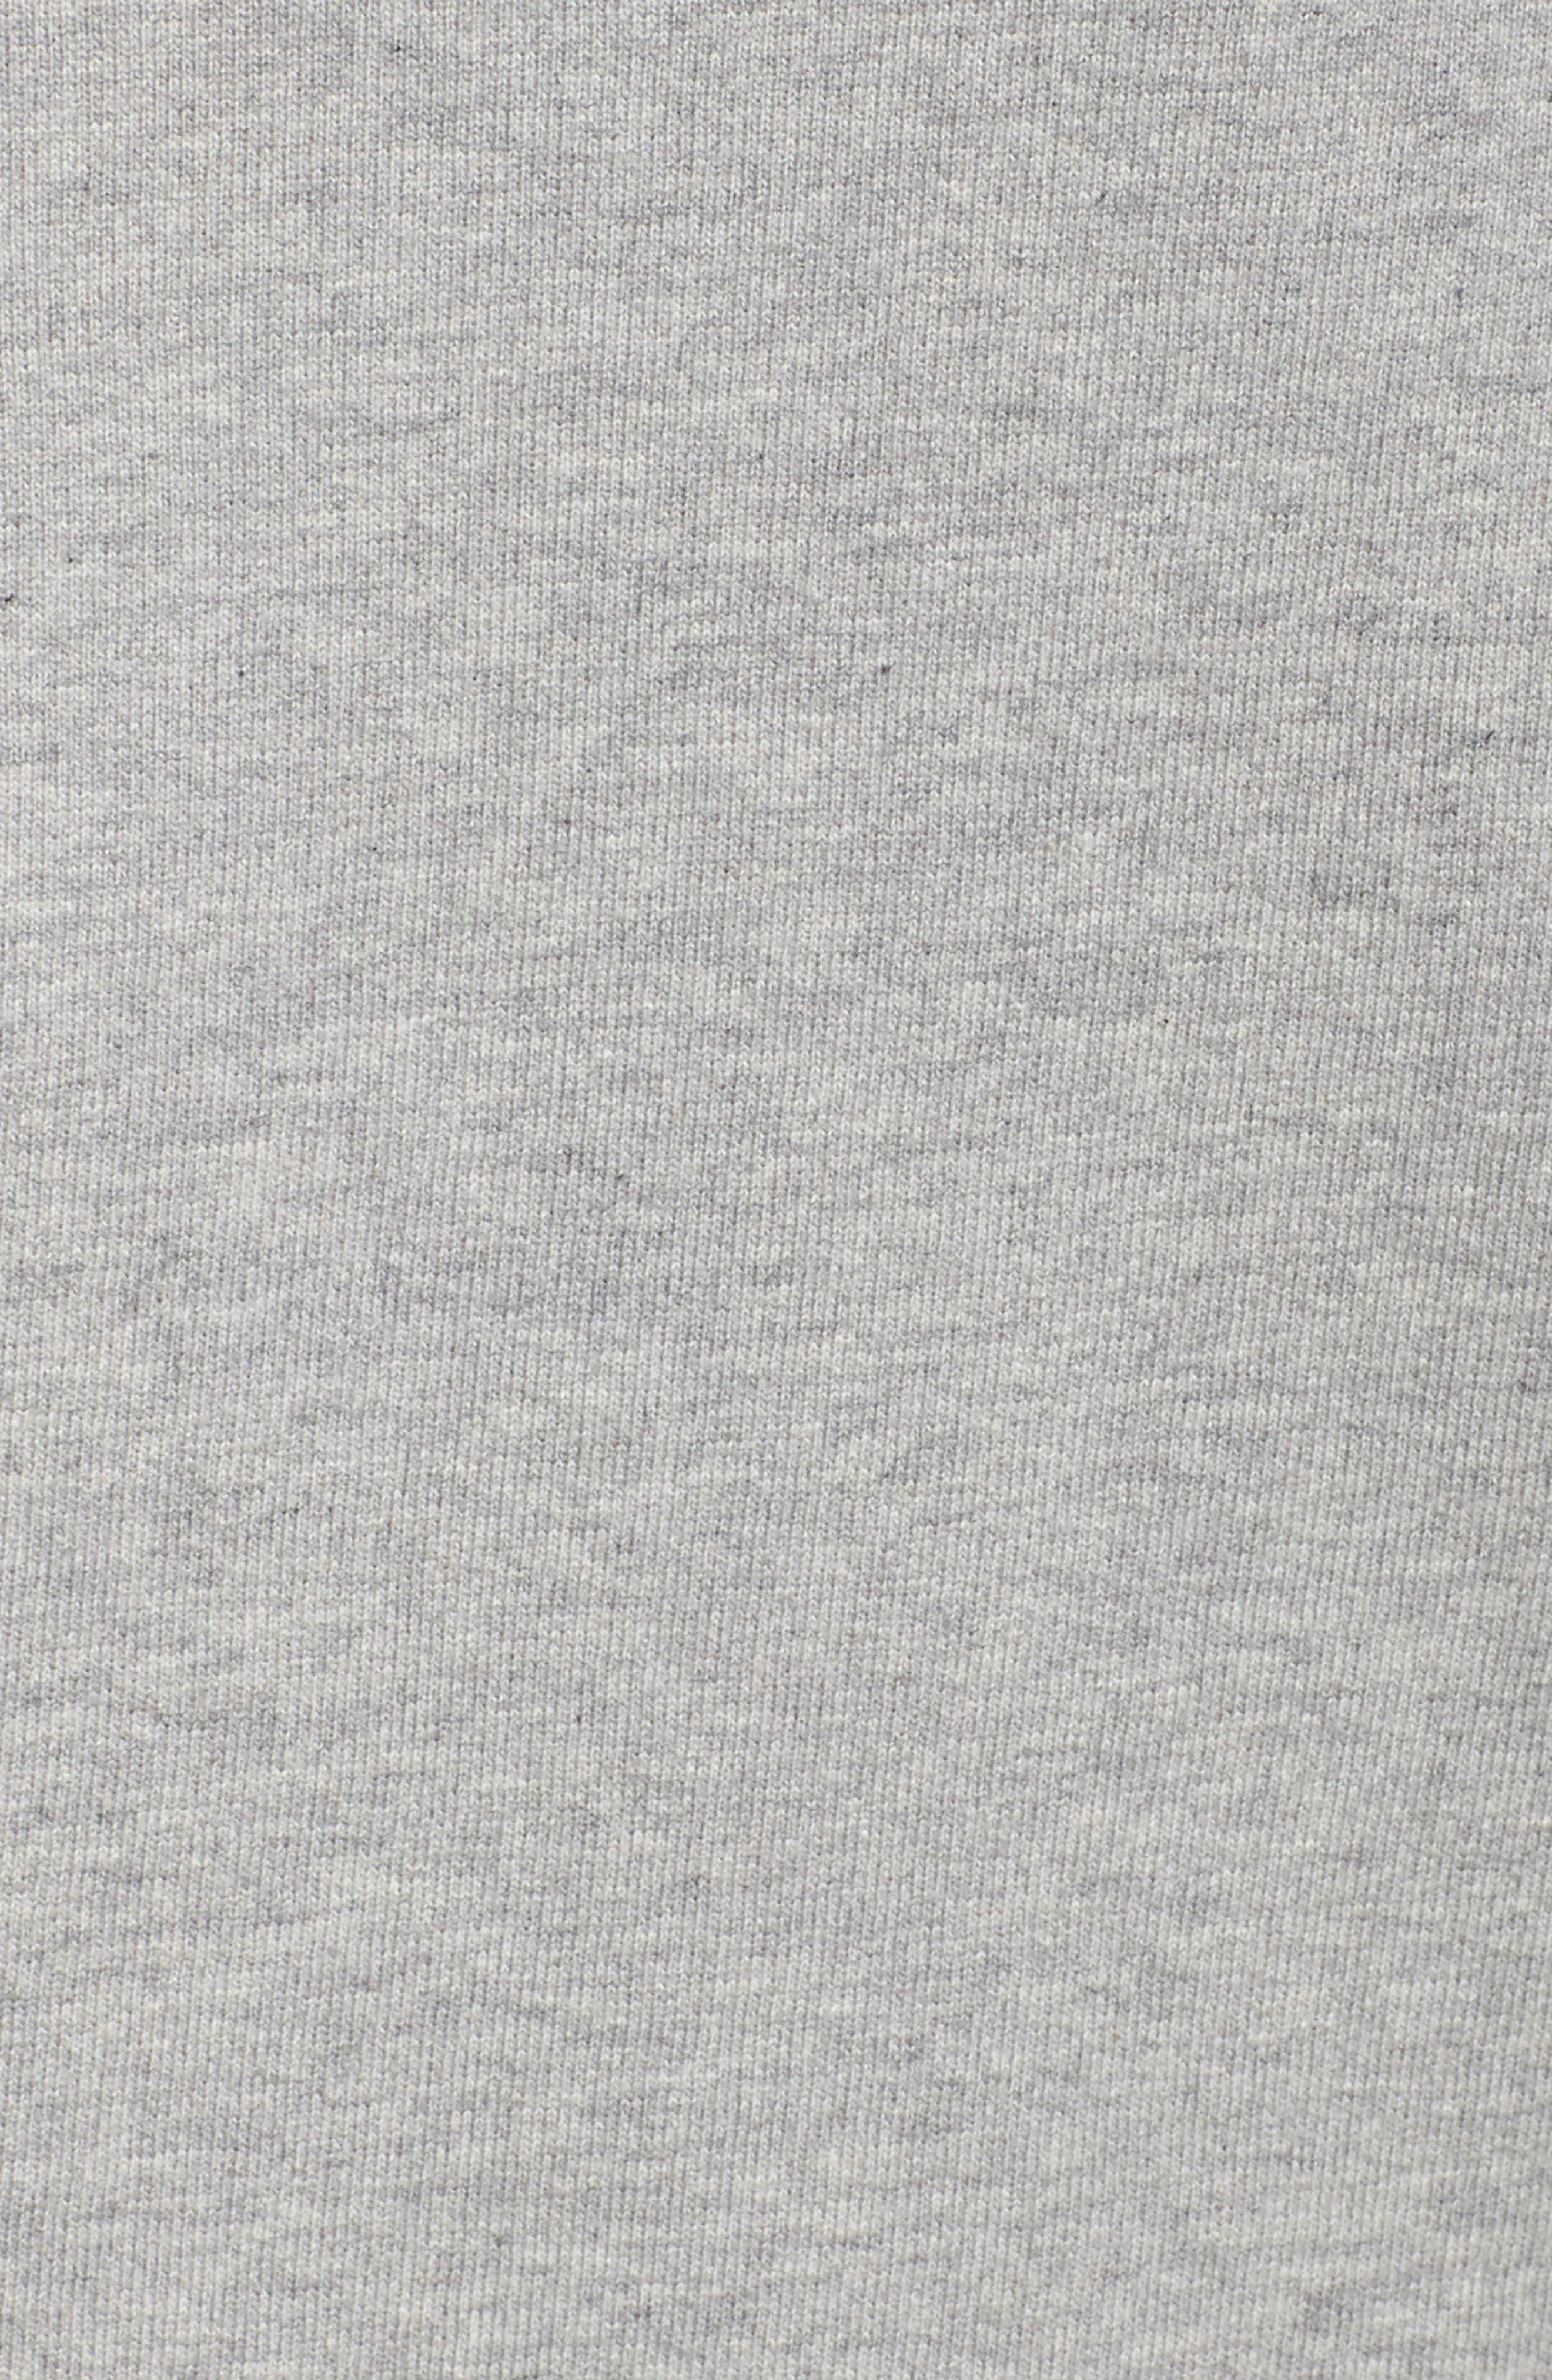 NFL Green Bay Packers Champion Sweatshirt,                             Alternate thumbnail 5, color,                             028